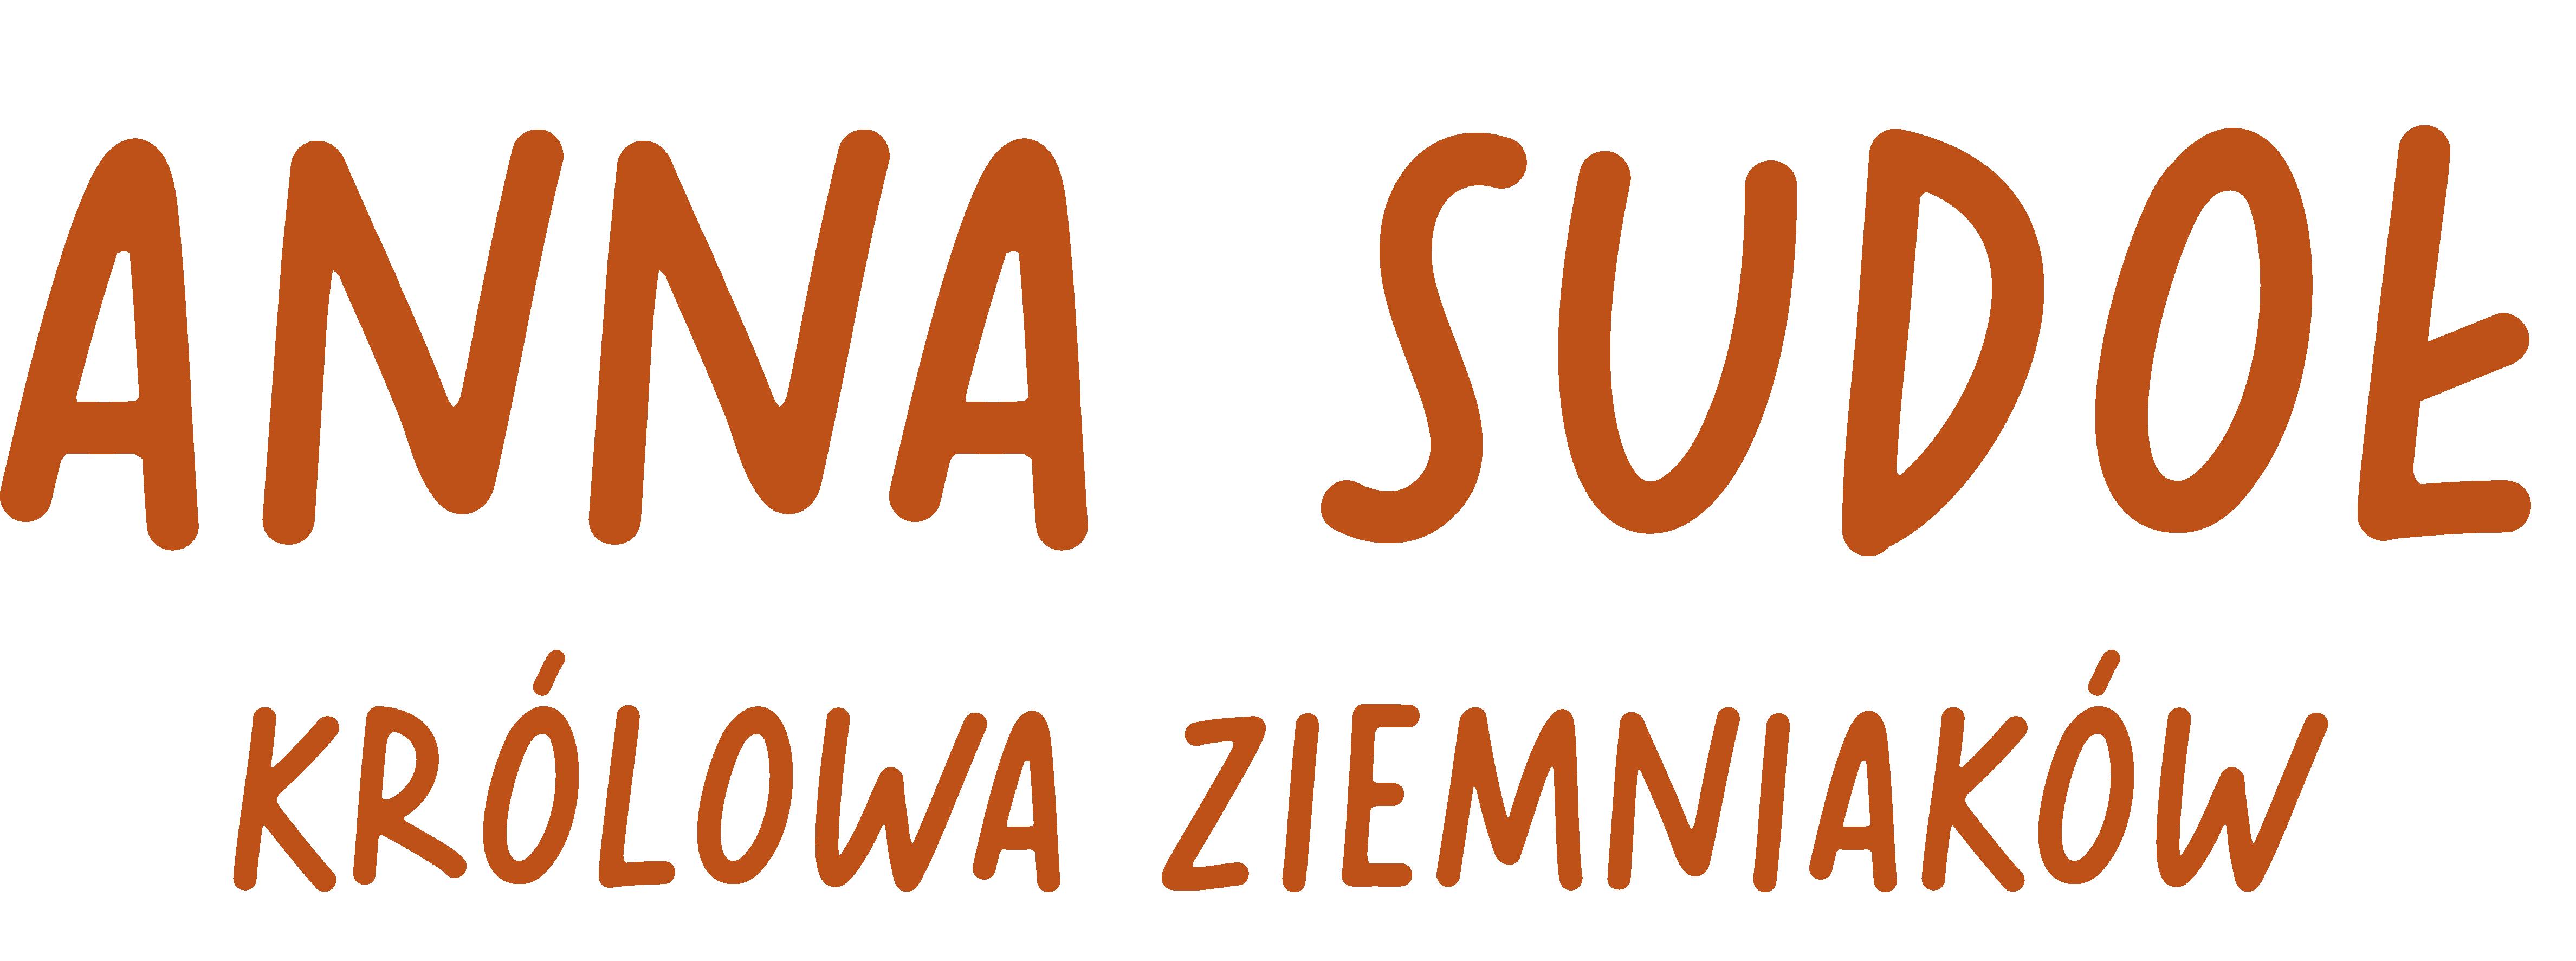 Anna Sudoł logo